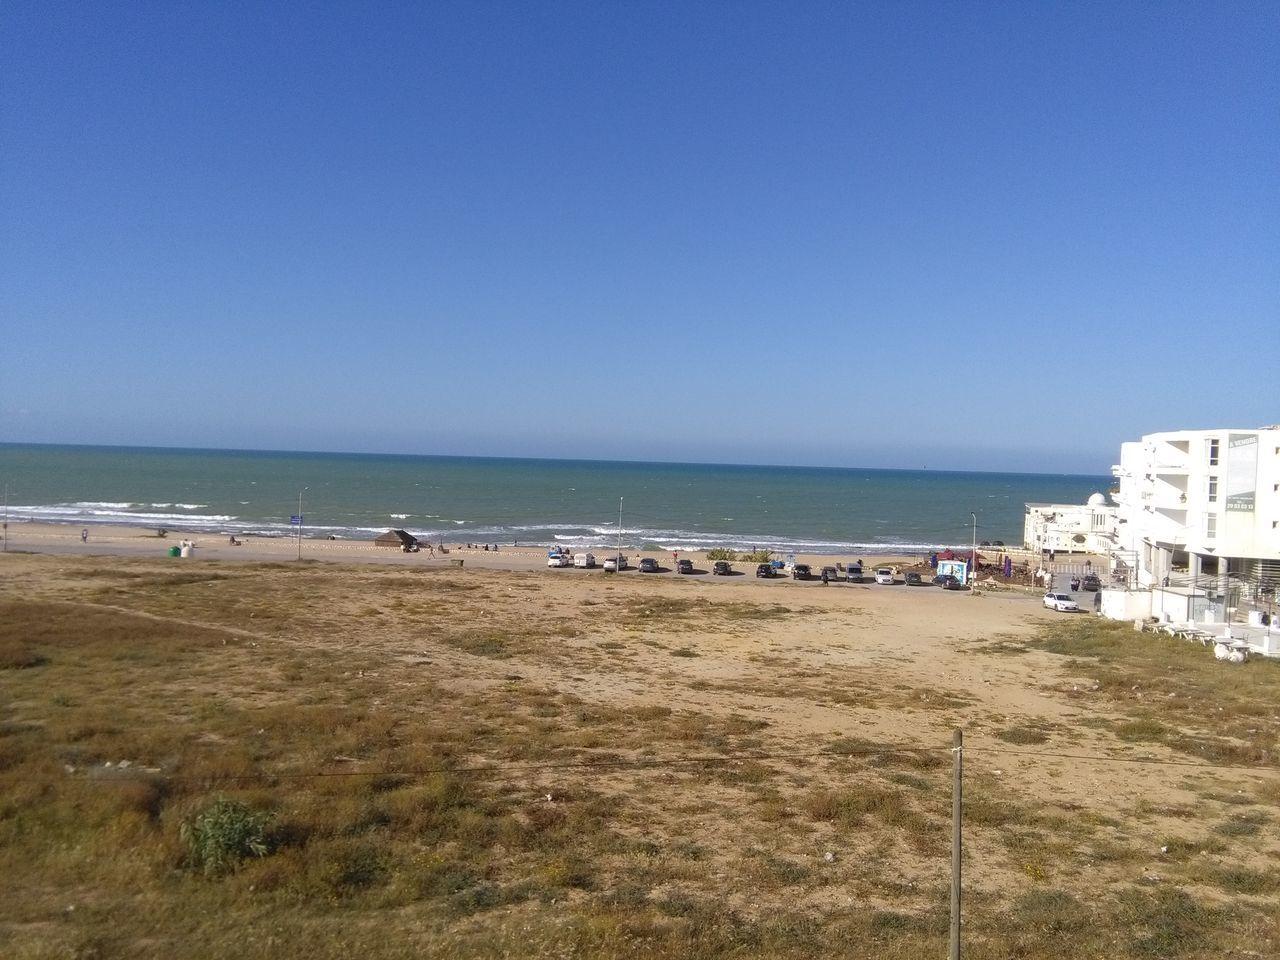 View Enjoying Life Eyeem Tunisia Enjoying The Sun Place Public Sunshine La Marsa Beach Time Tunisia